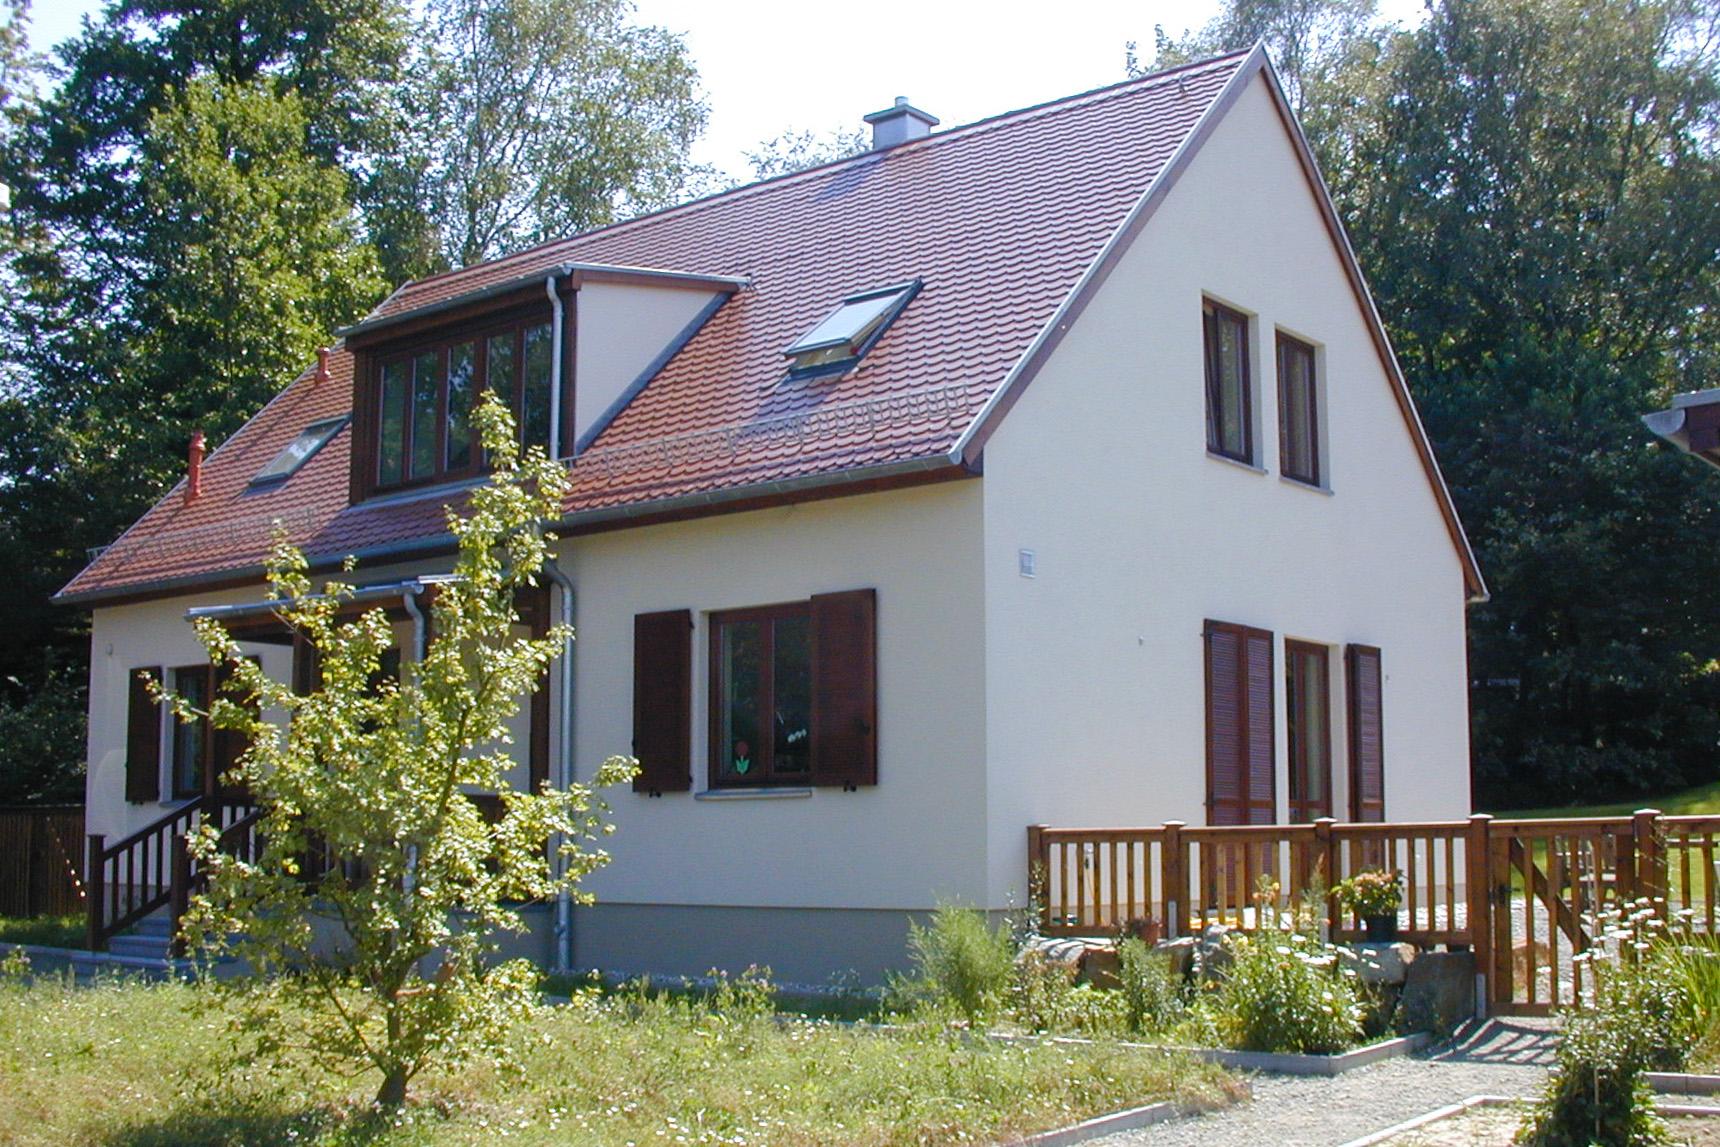 Referenz - Machern - AGL Massivhaus Projektbau GmbH